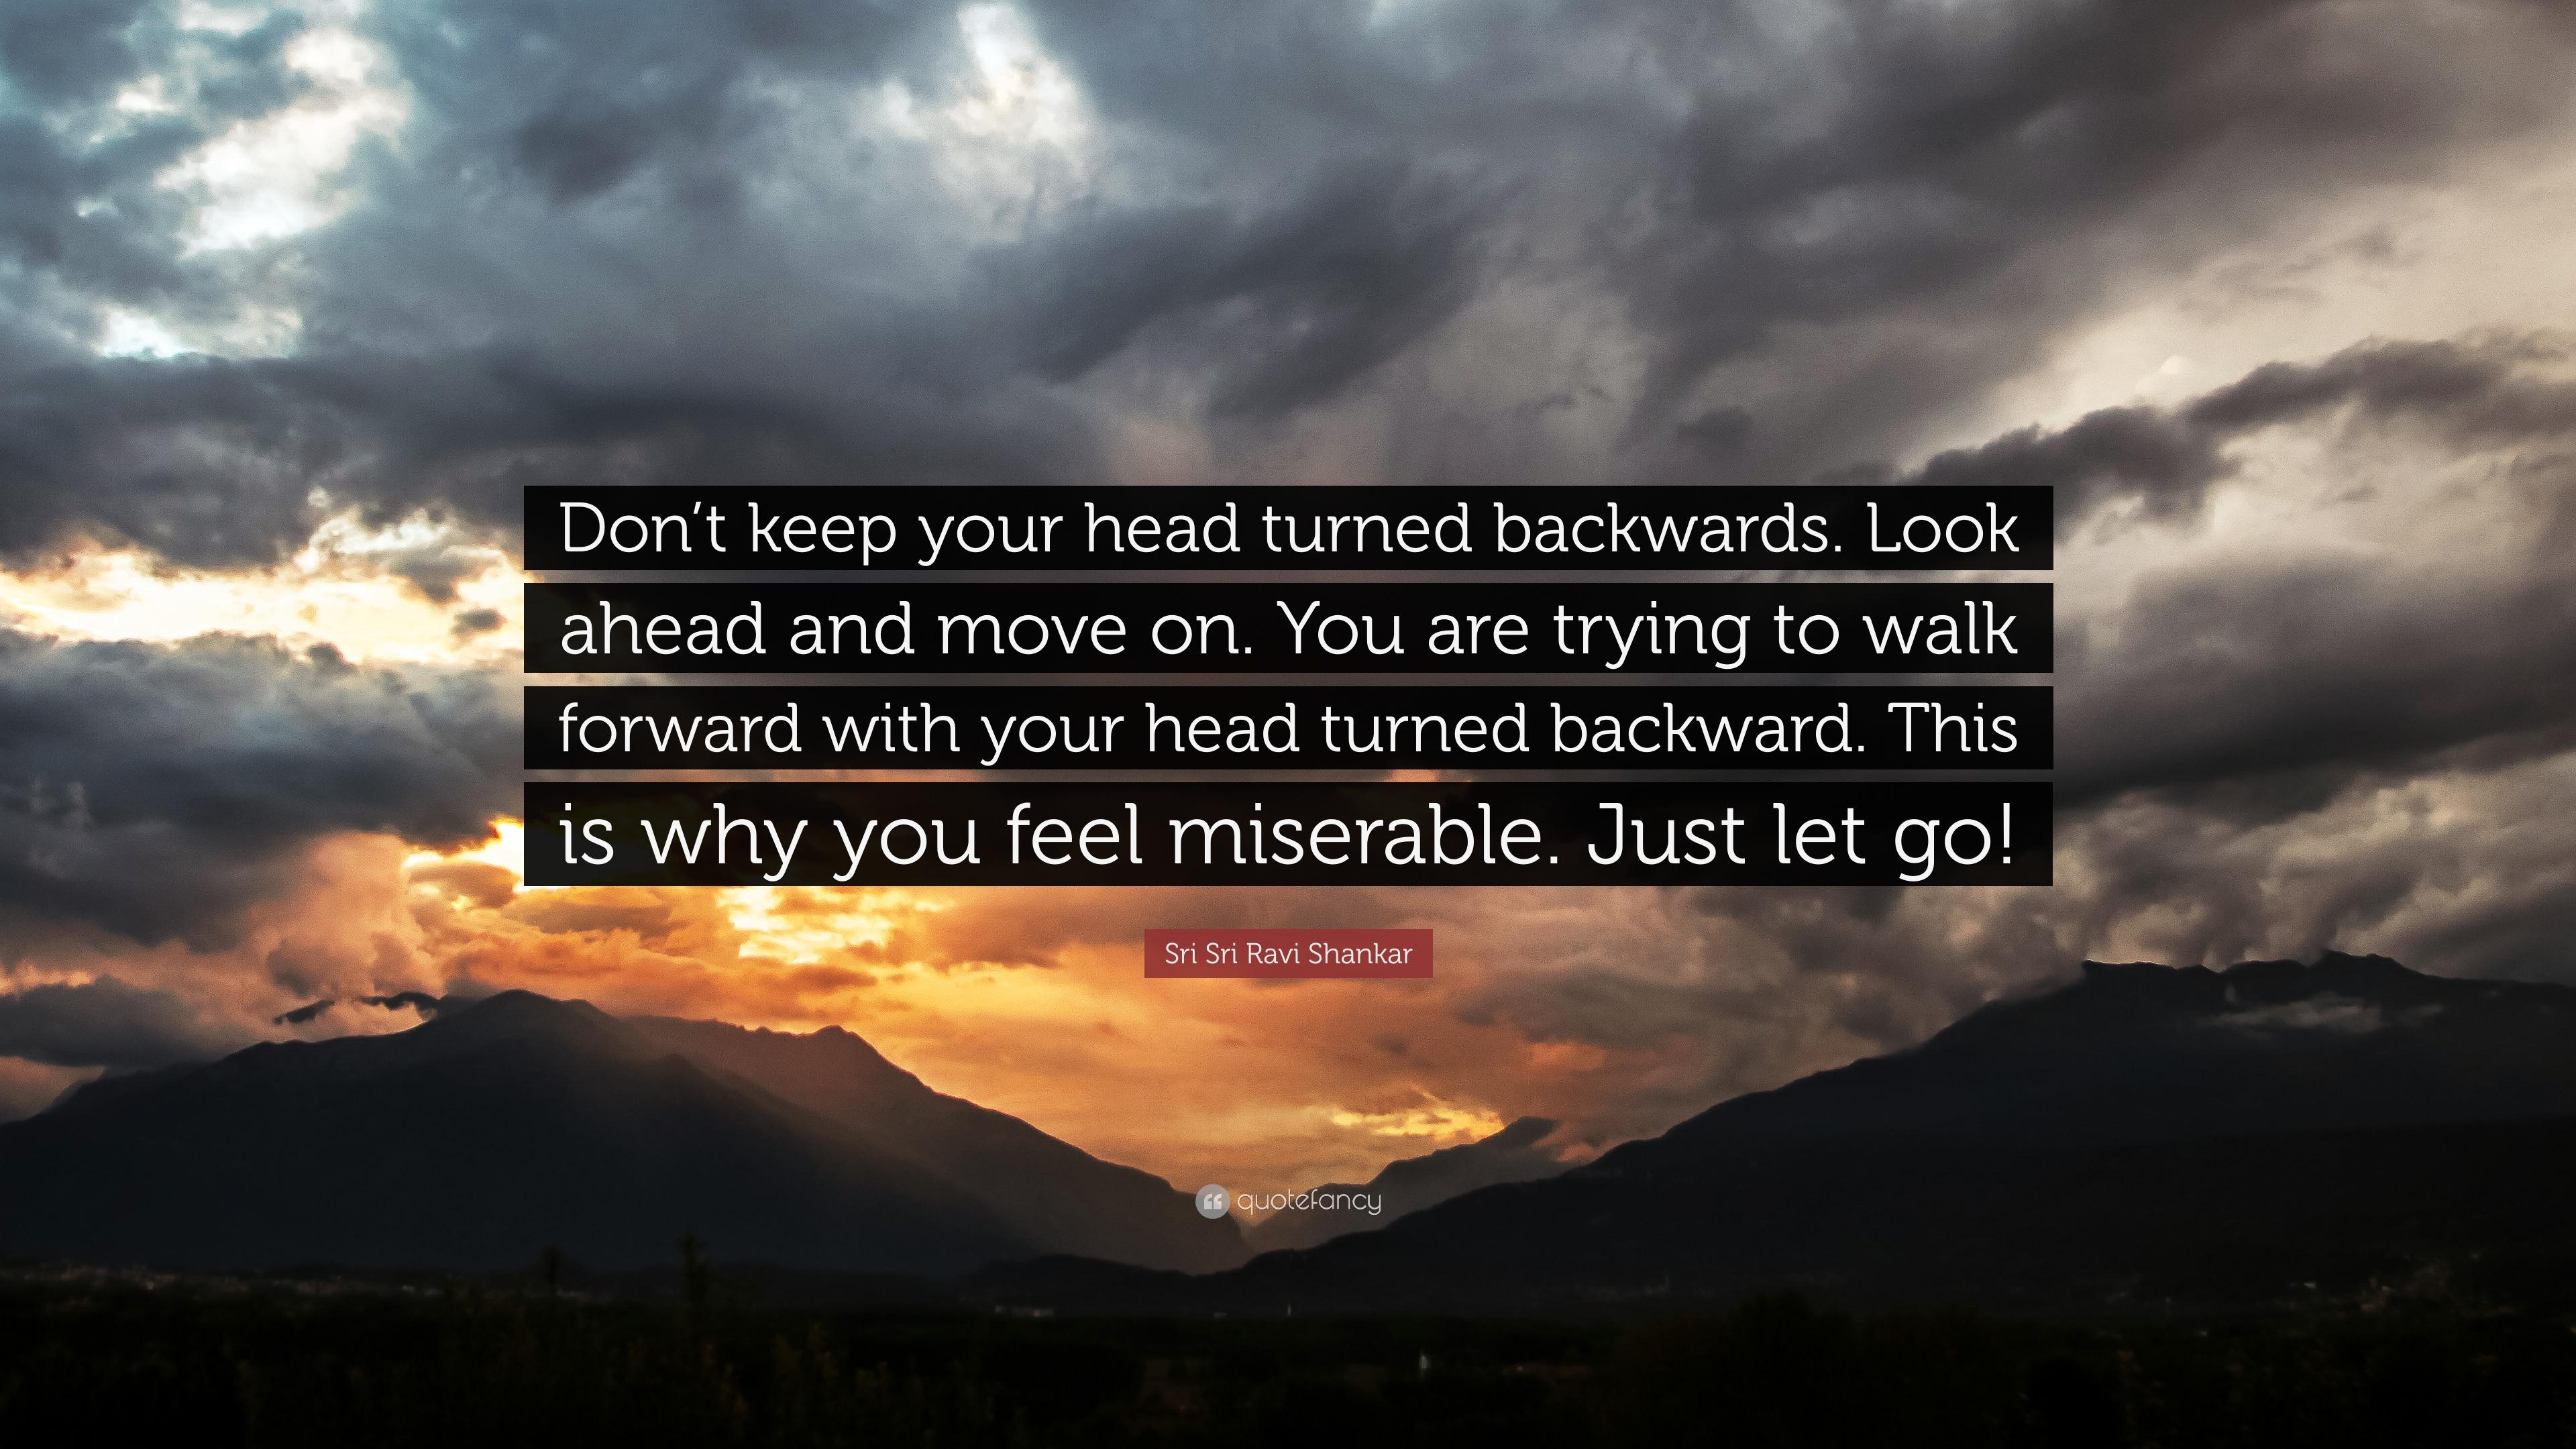 Awesome Sri Sri Ravi Shankar Quote: U201cDonu0027t Keep Your Head Turned Backwards.